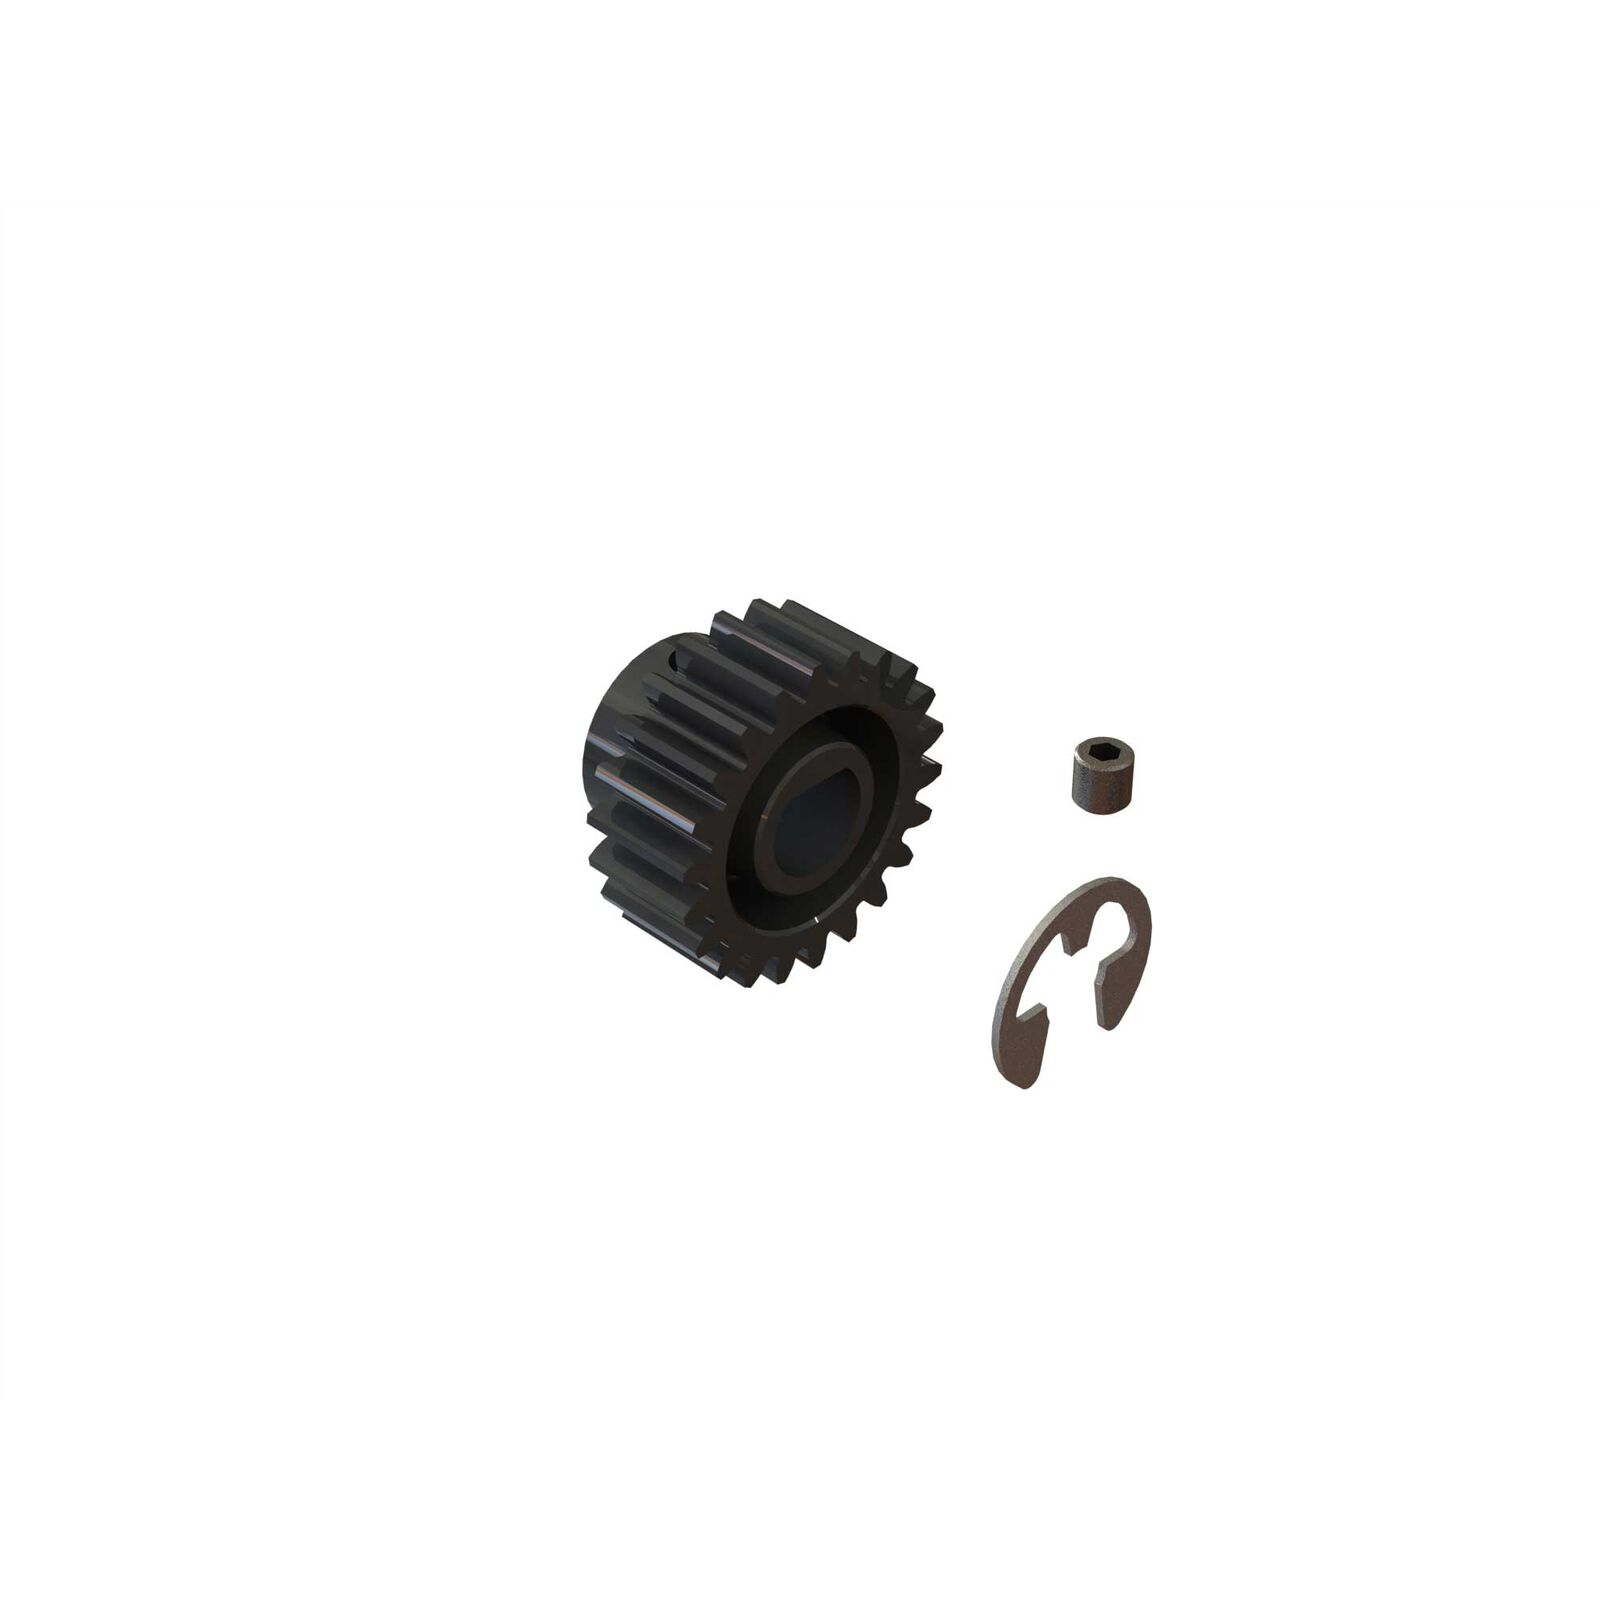 22T Mod1 Safe-D8 Pinion Gear